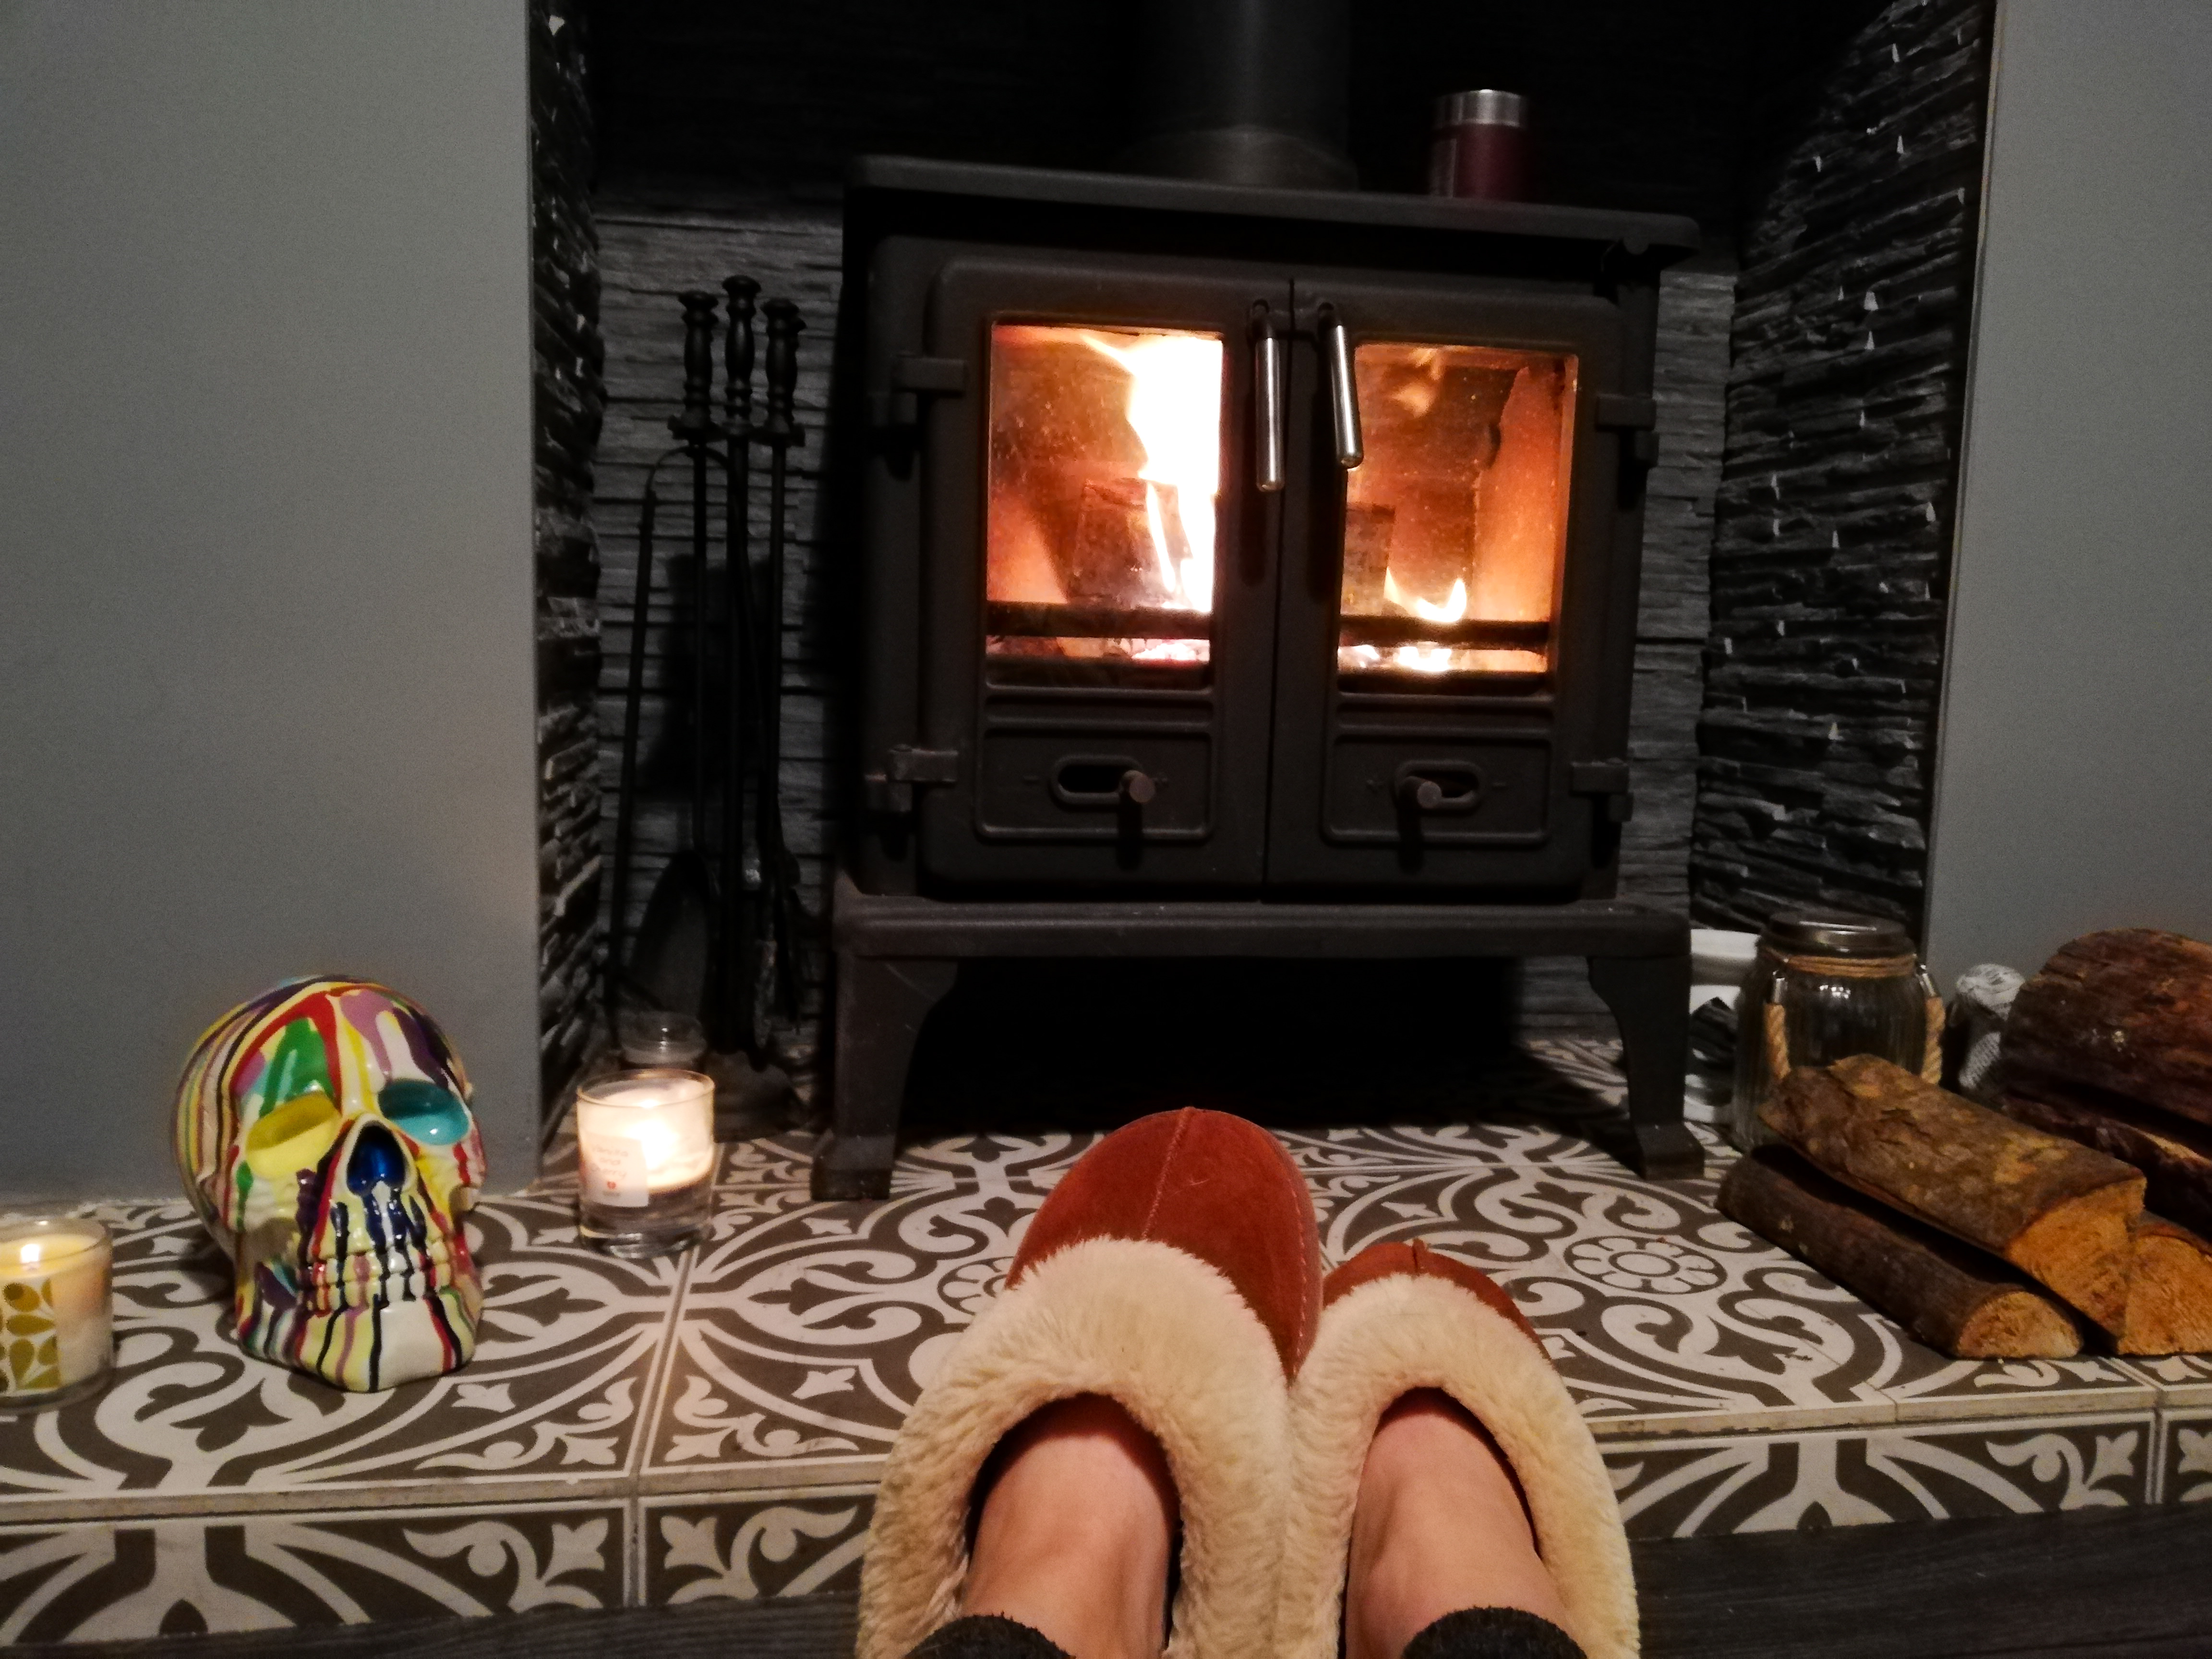 eShores Romantic Night In Log Burner